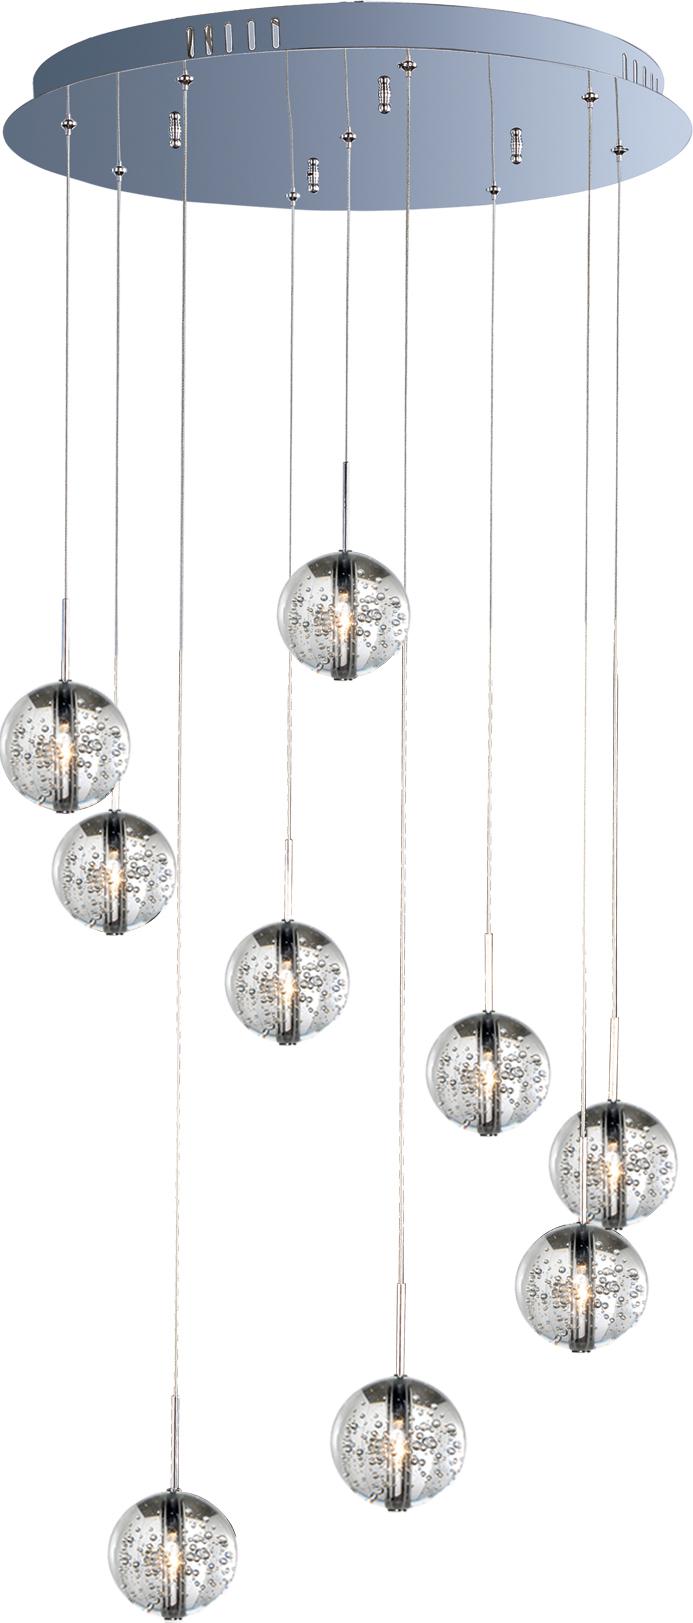 Orb 9-Light Pendant